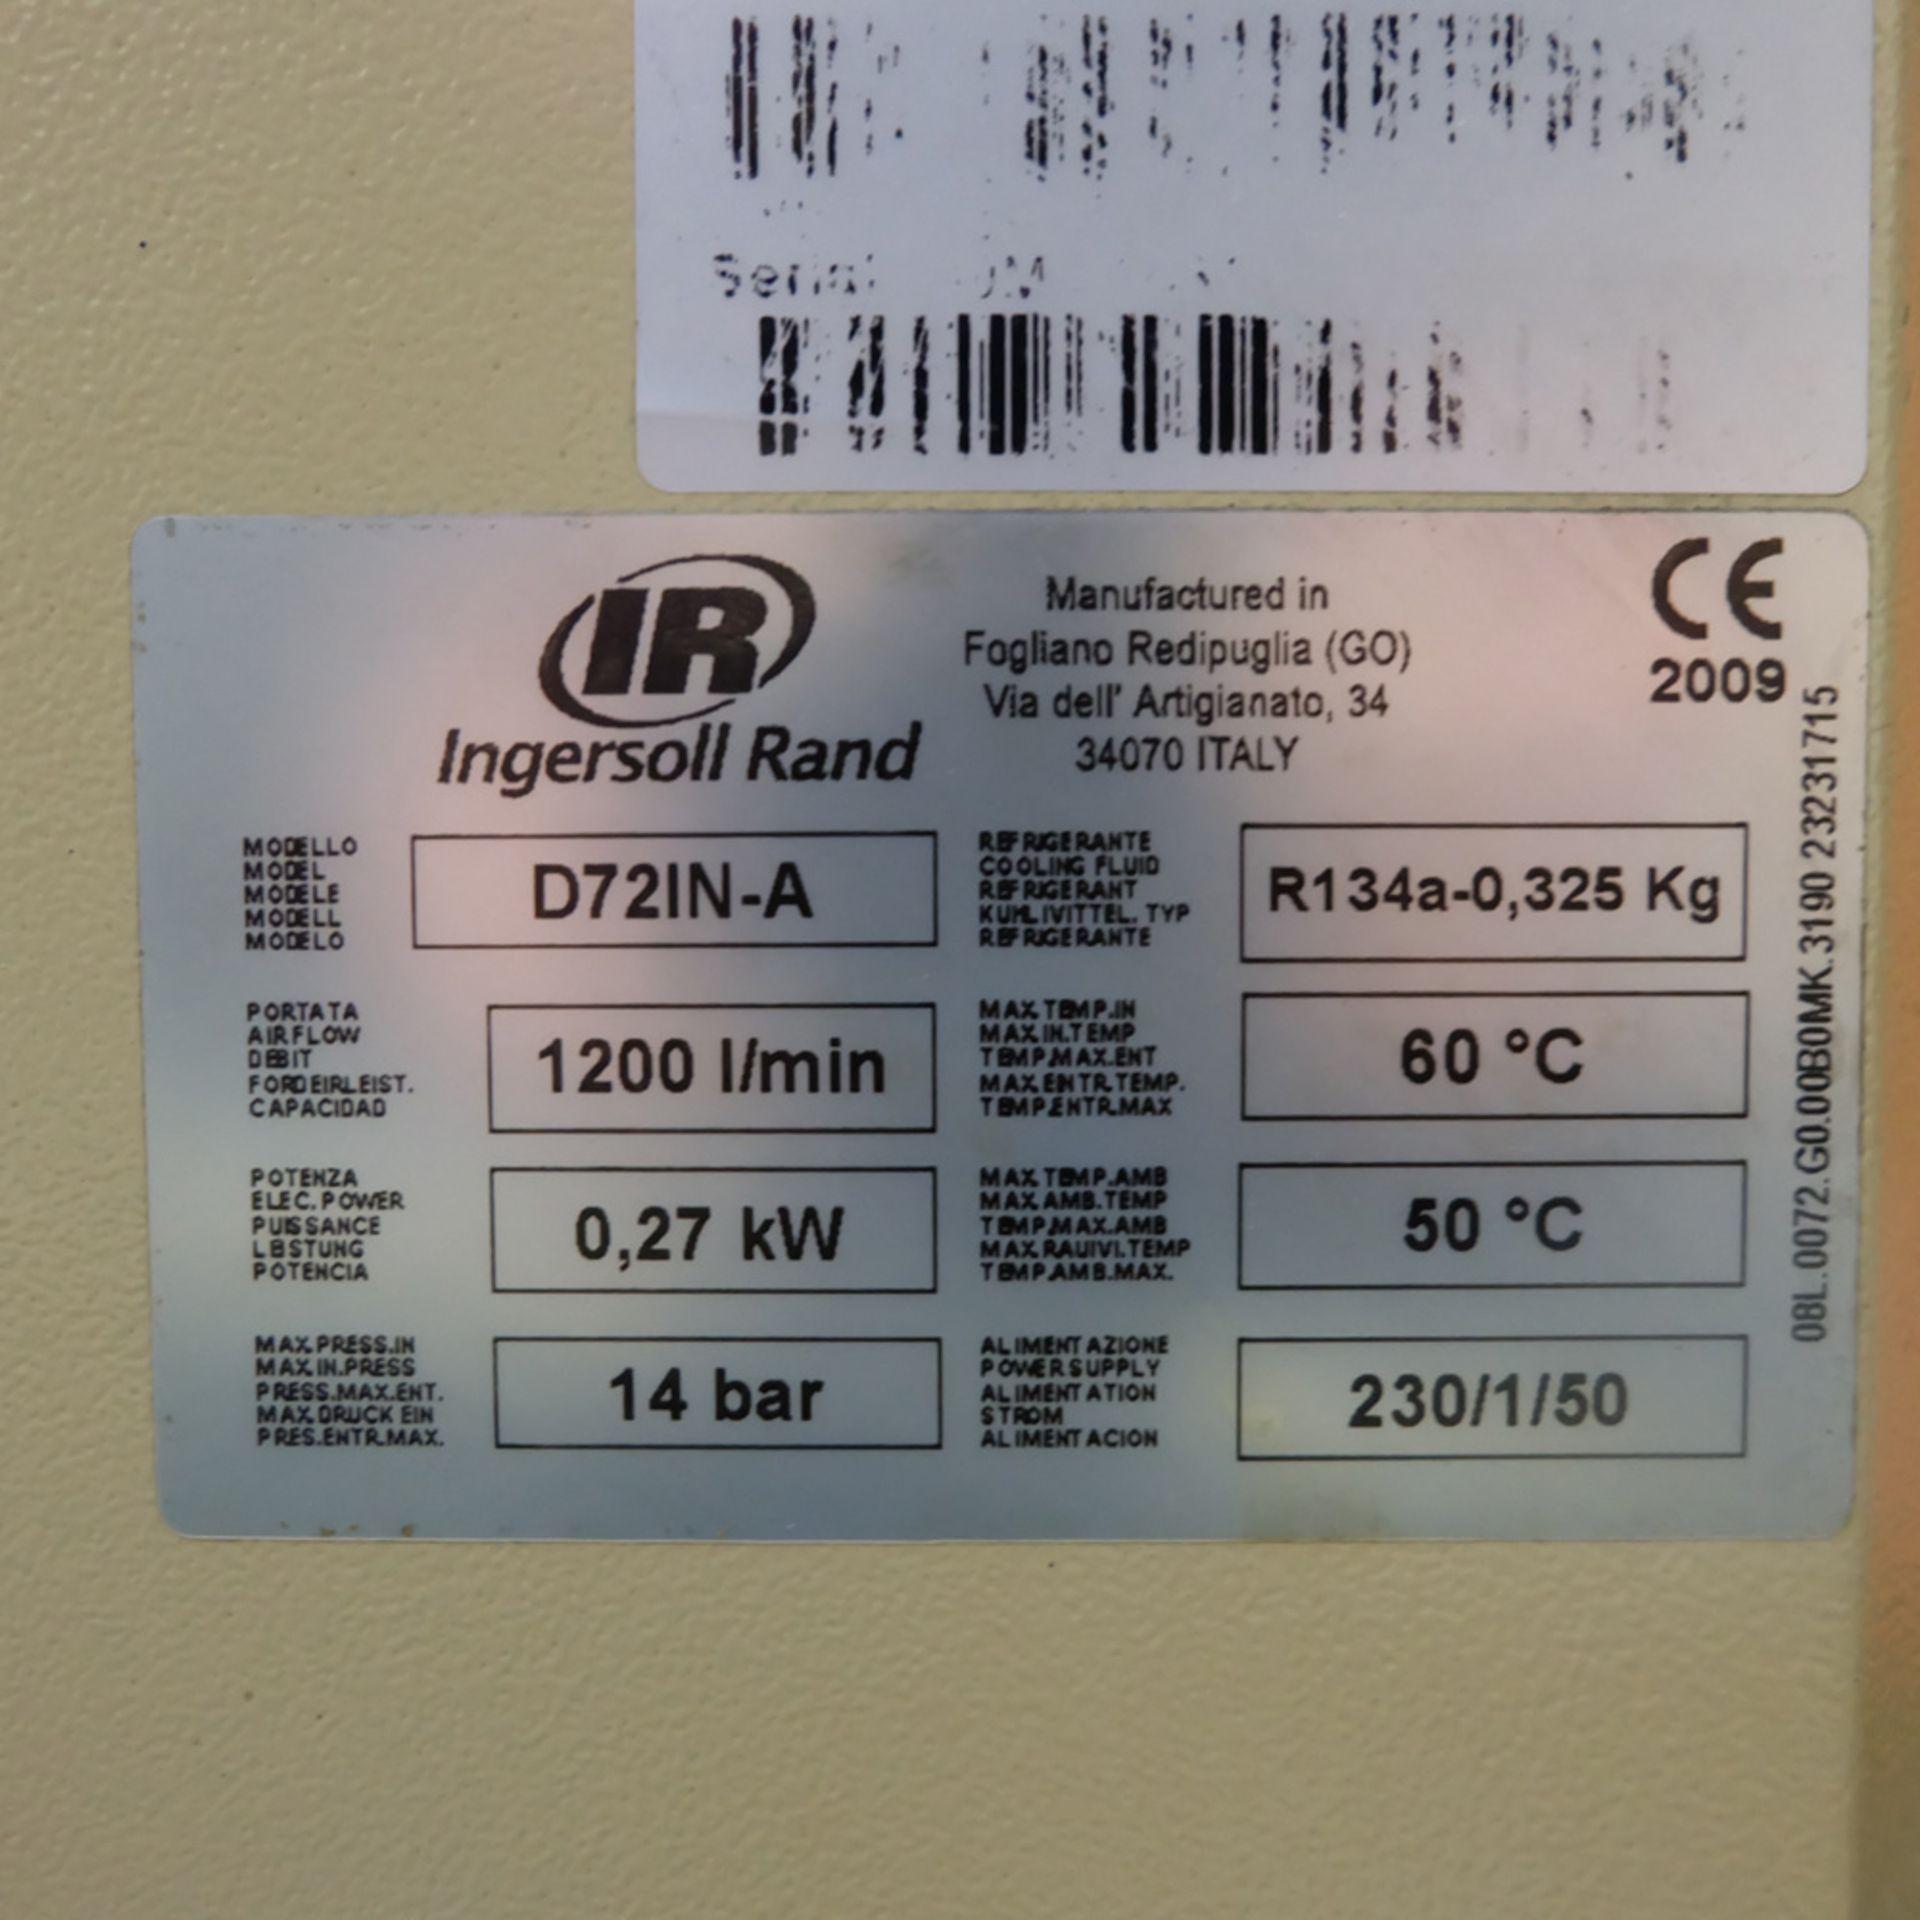 Ingersoll Rand Model R5.5IU D-SD Rotary Air Compressor. Working Pressure 10 Bar. - Image 8 of 9